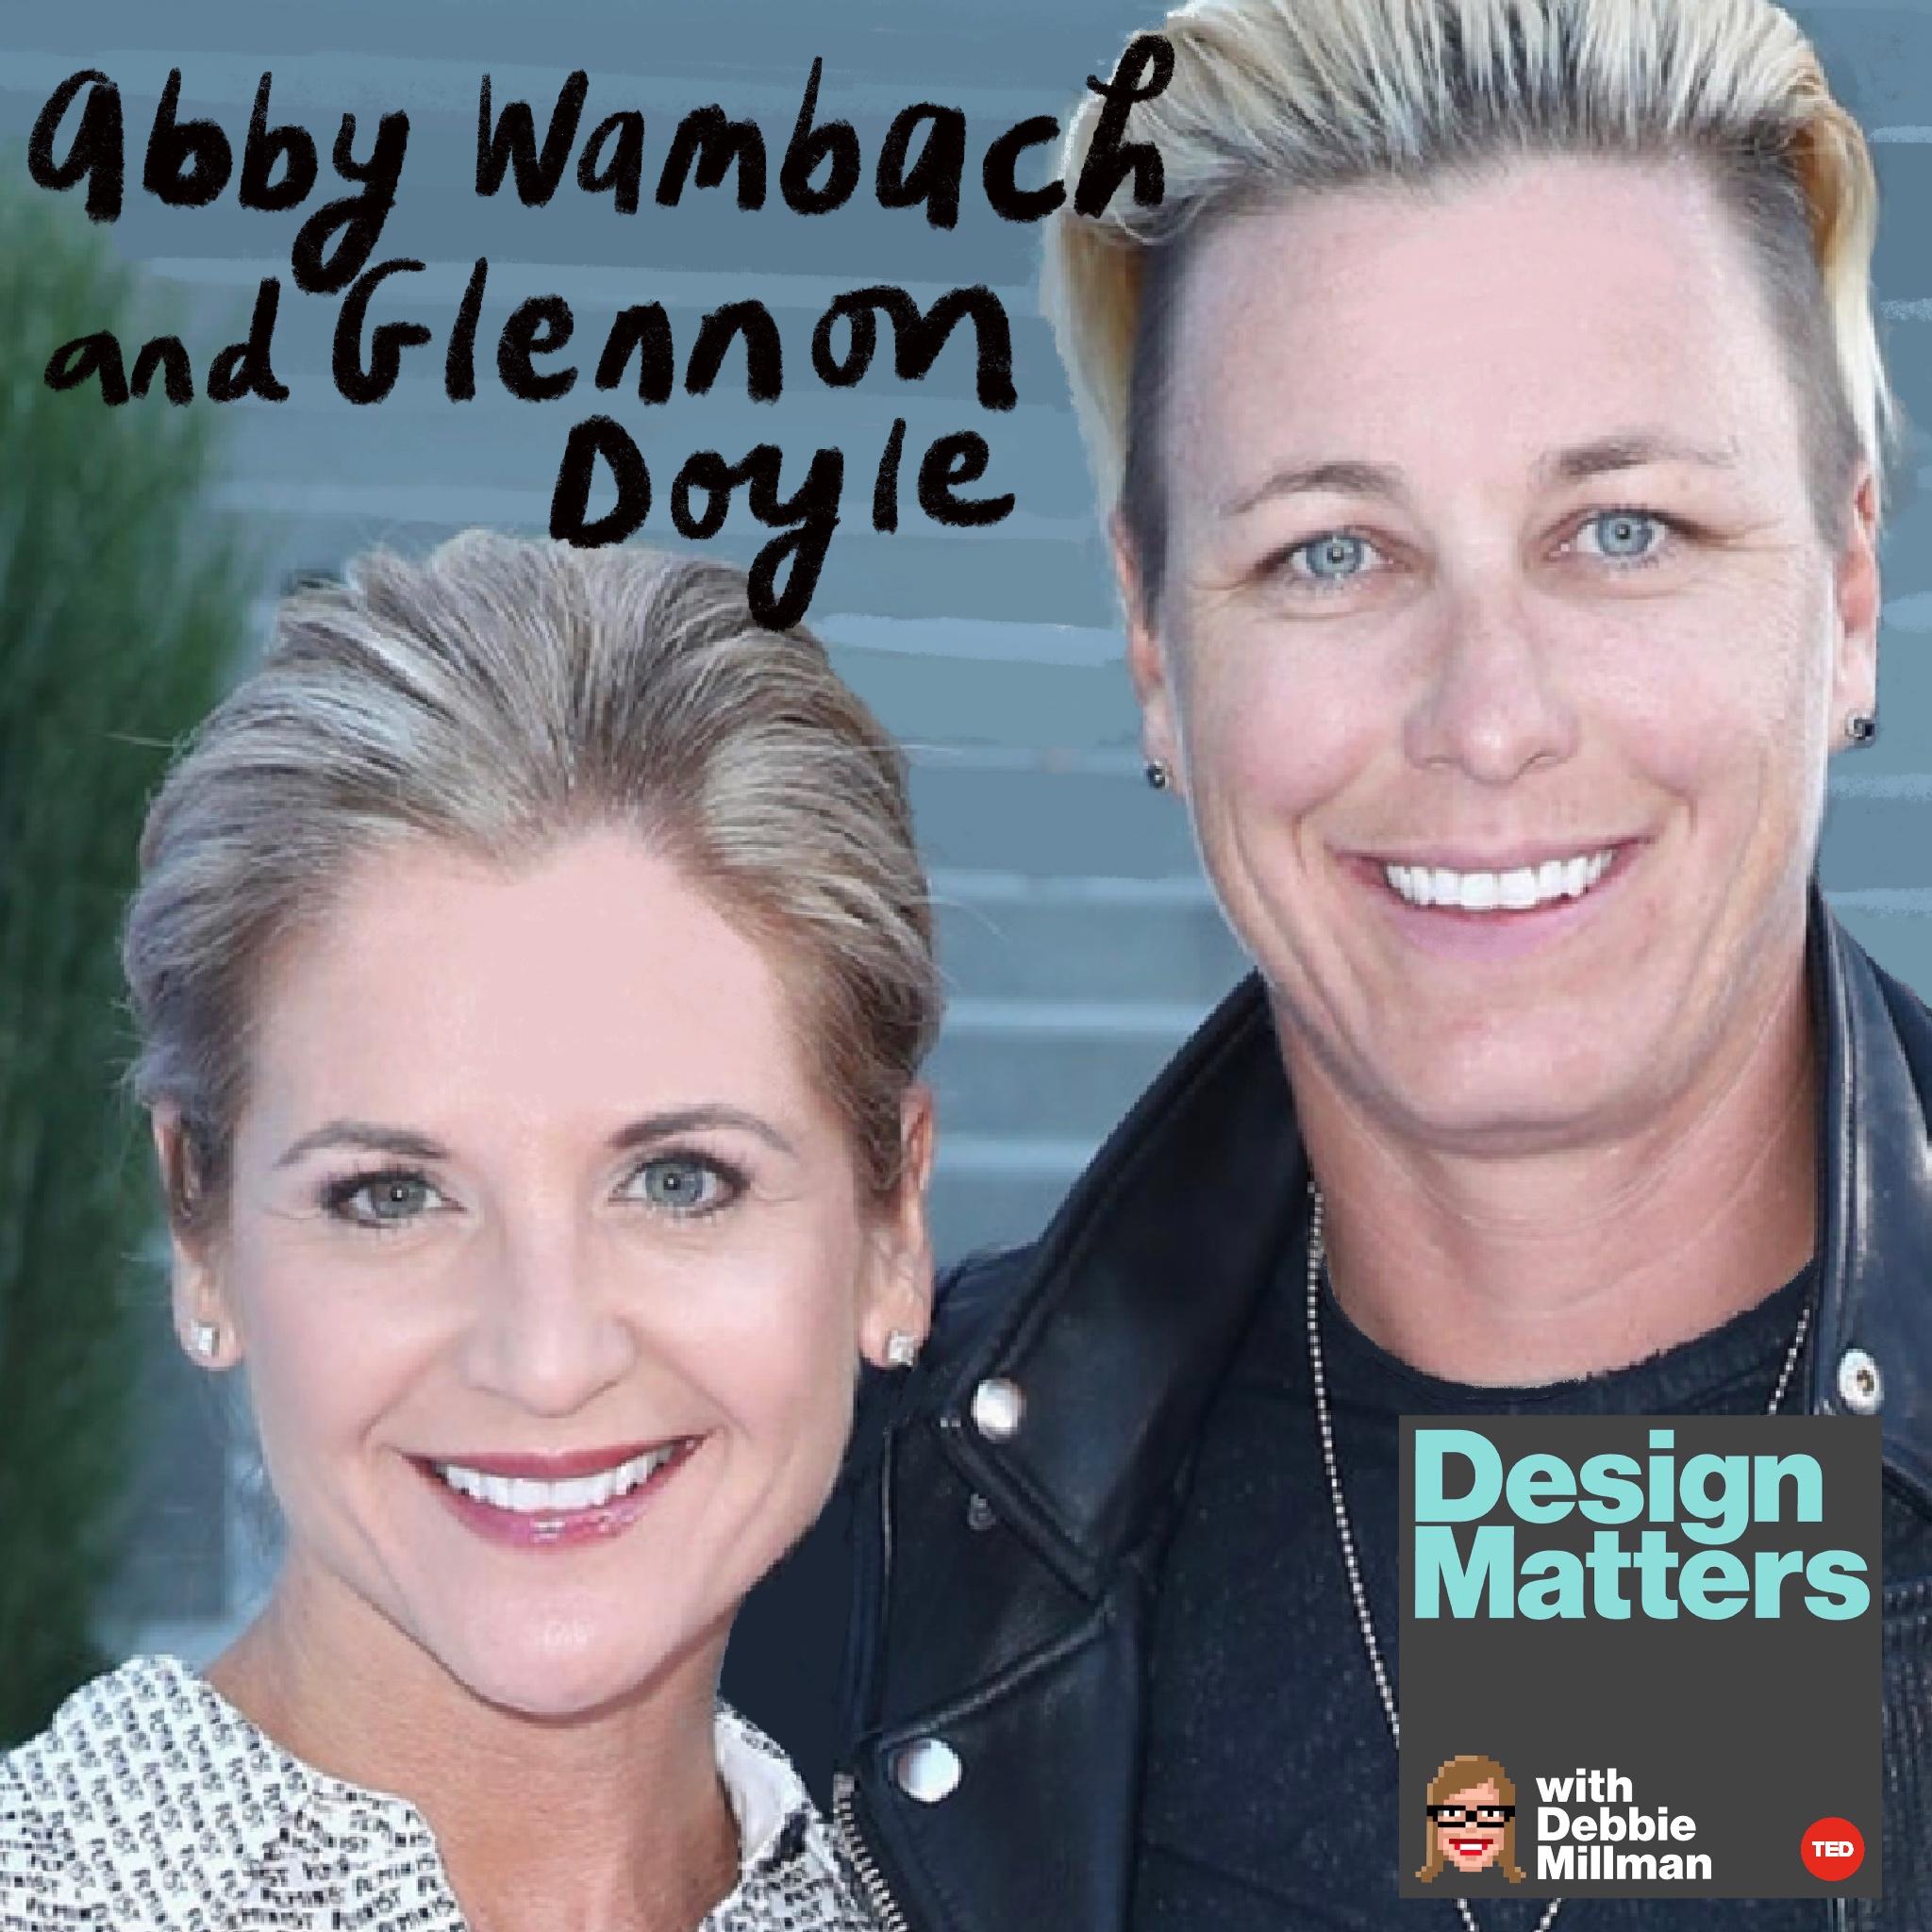 Glennon Doyle & Abby Wambach